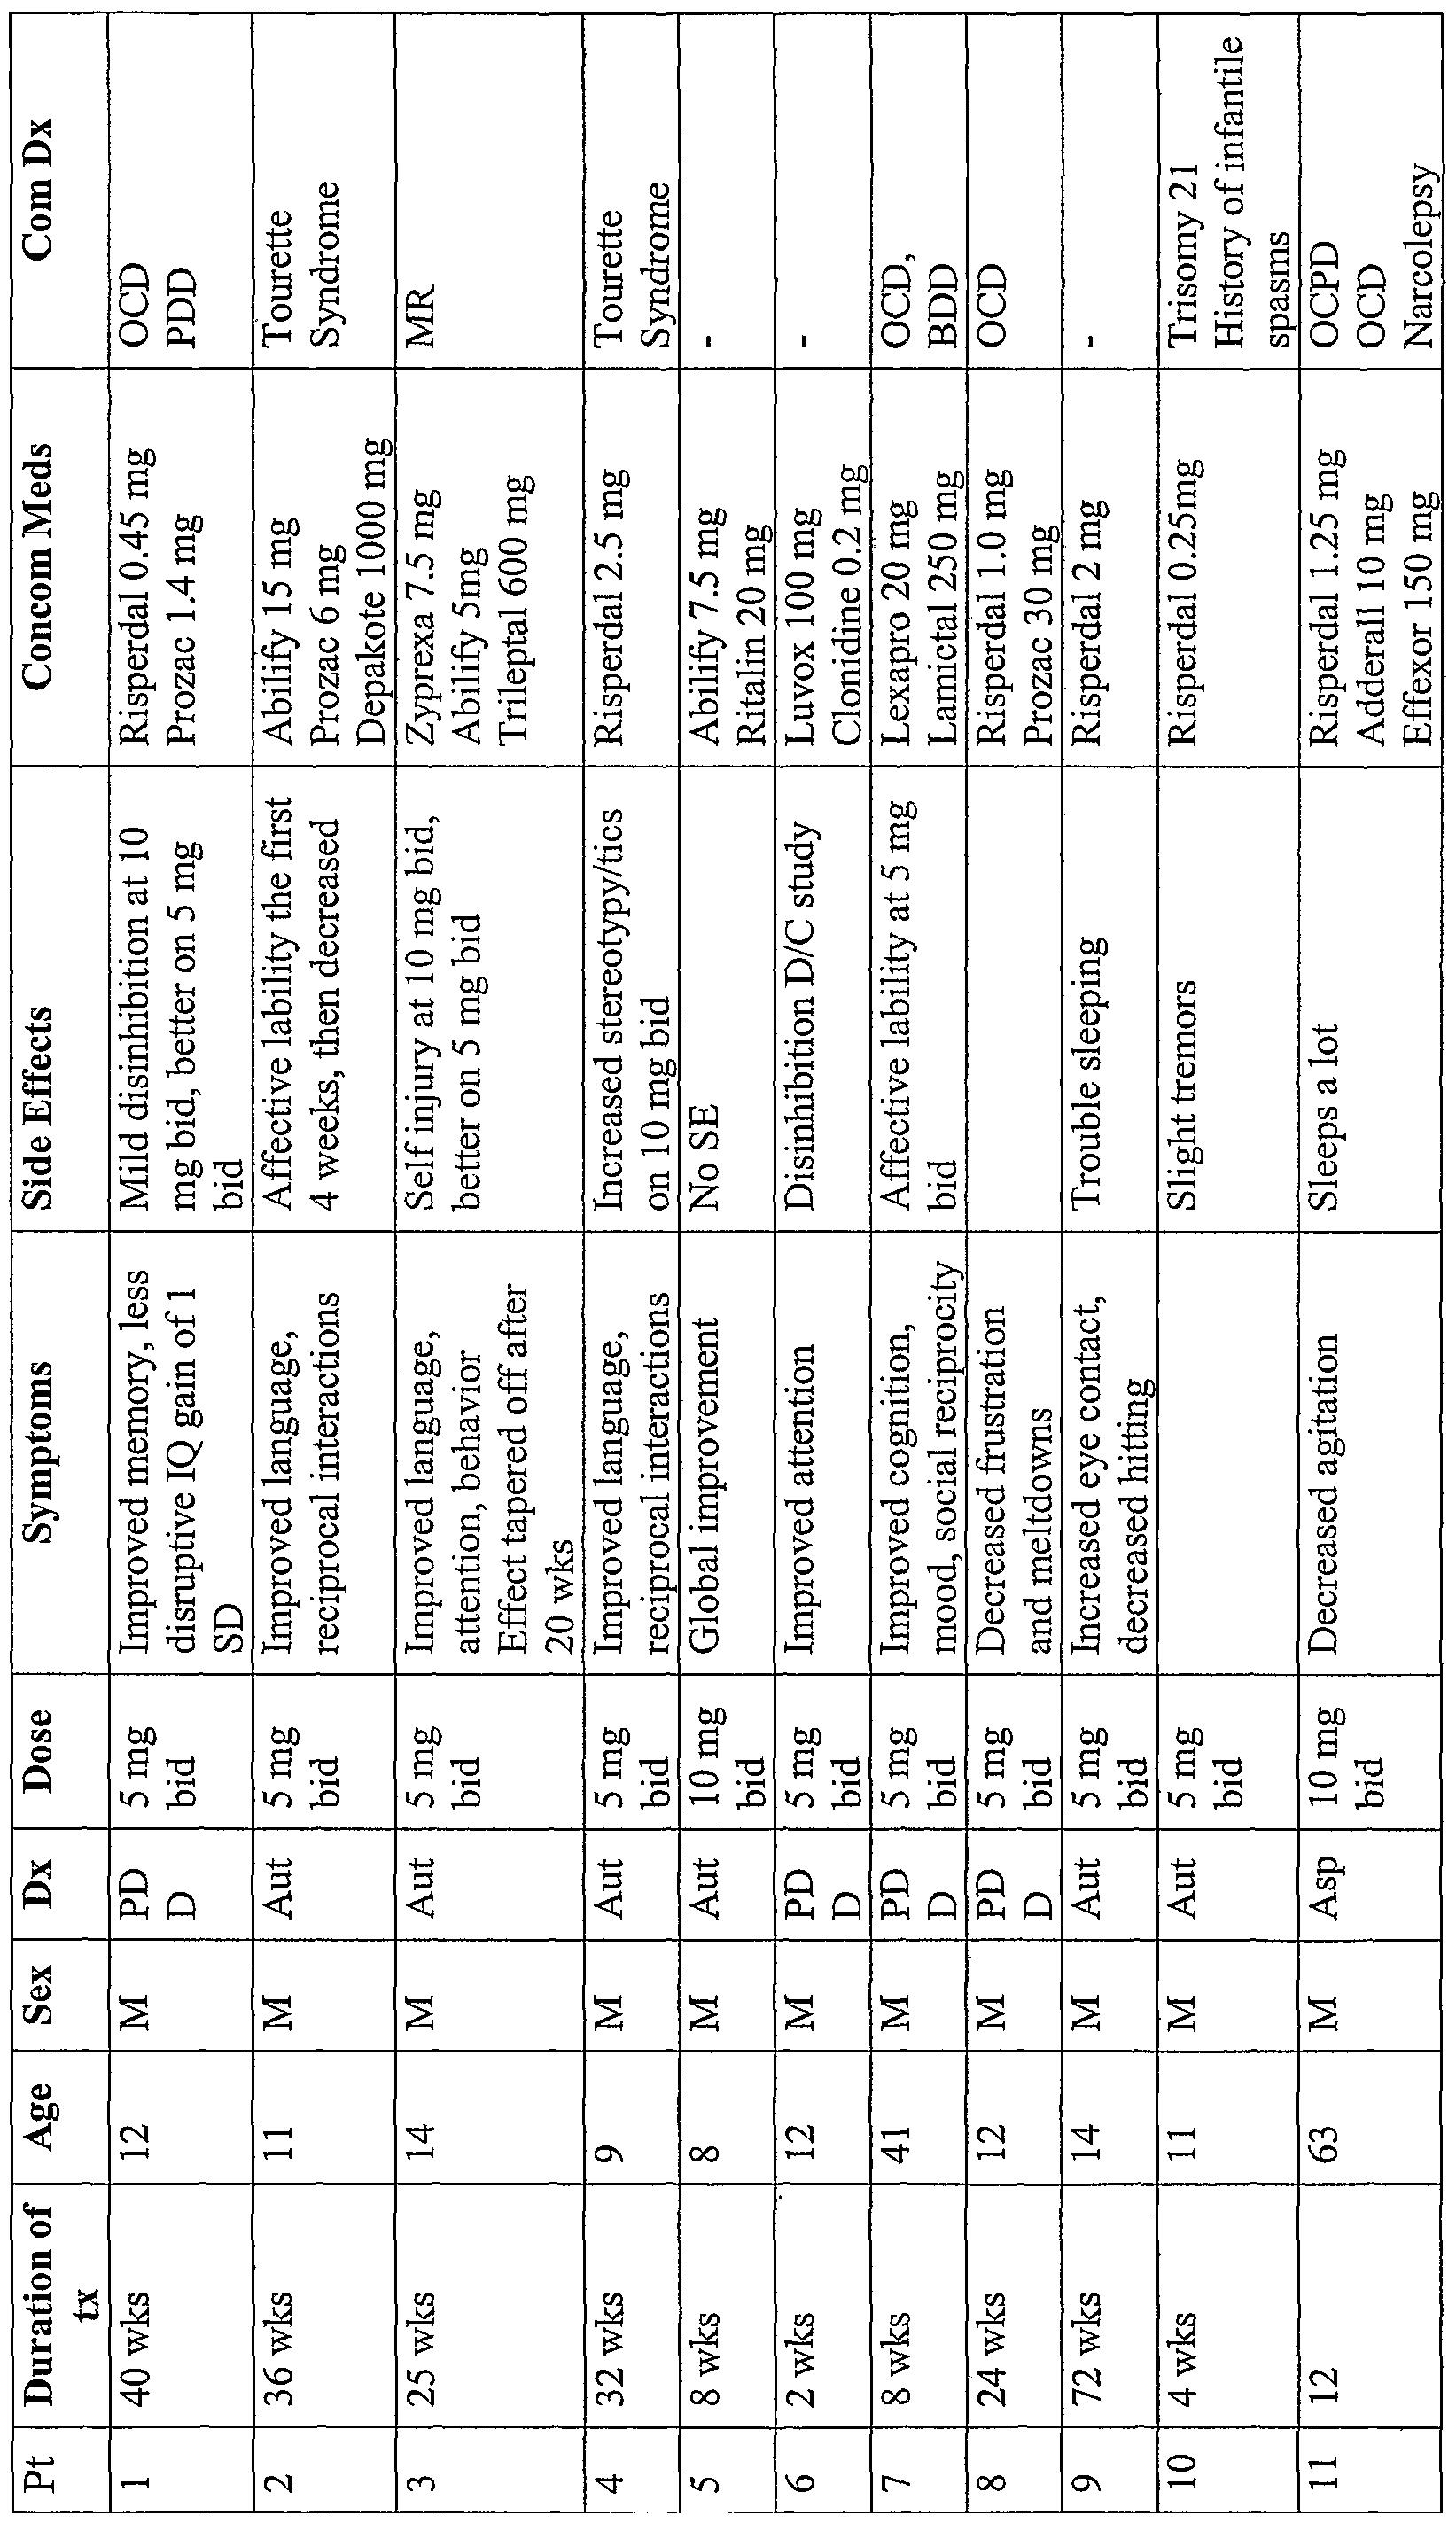 WO2006034187A2 - Use of memantine (namenda) to treat autism